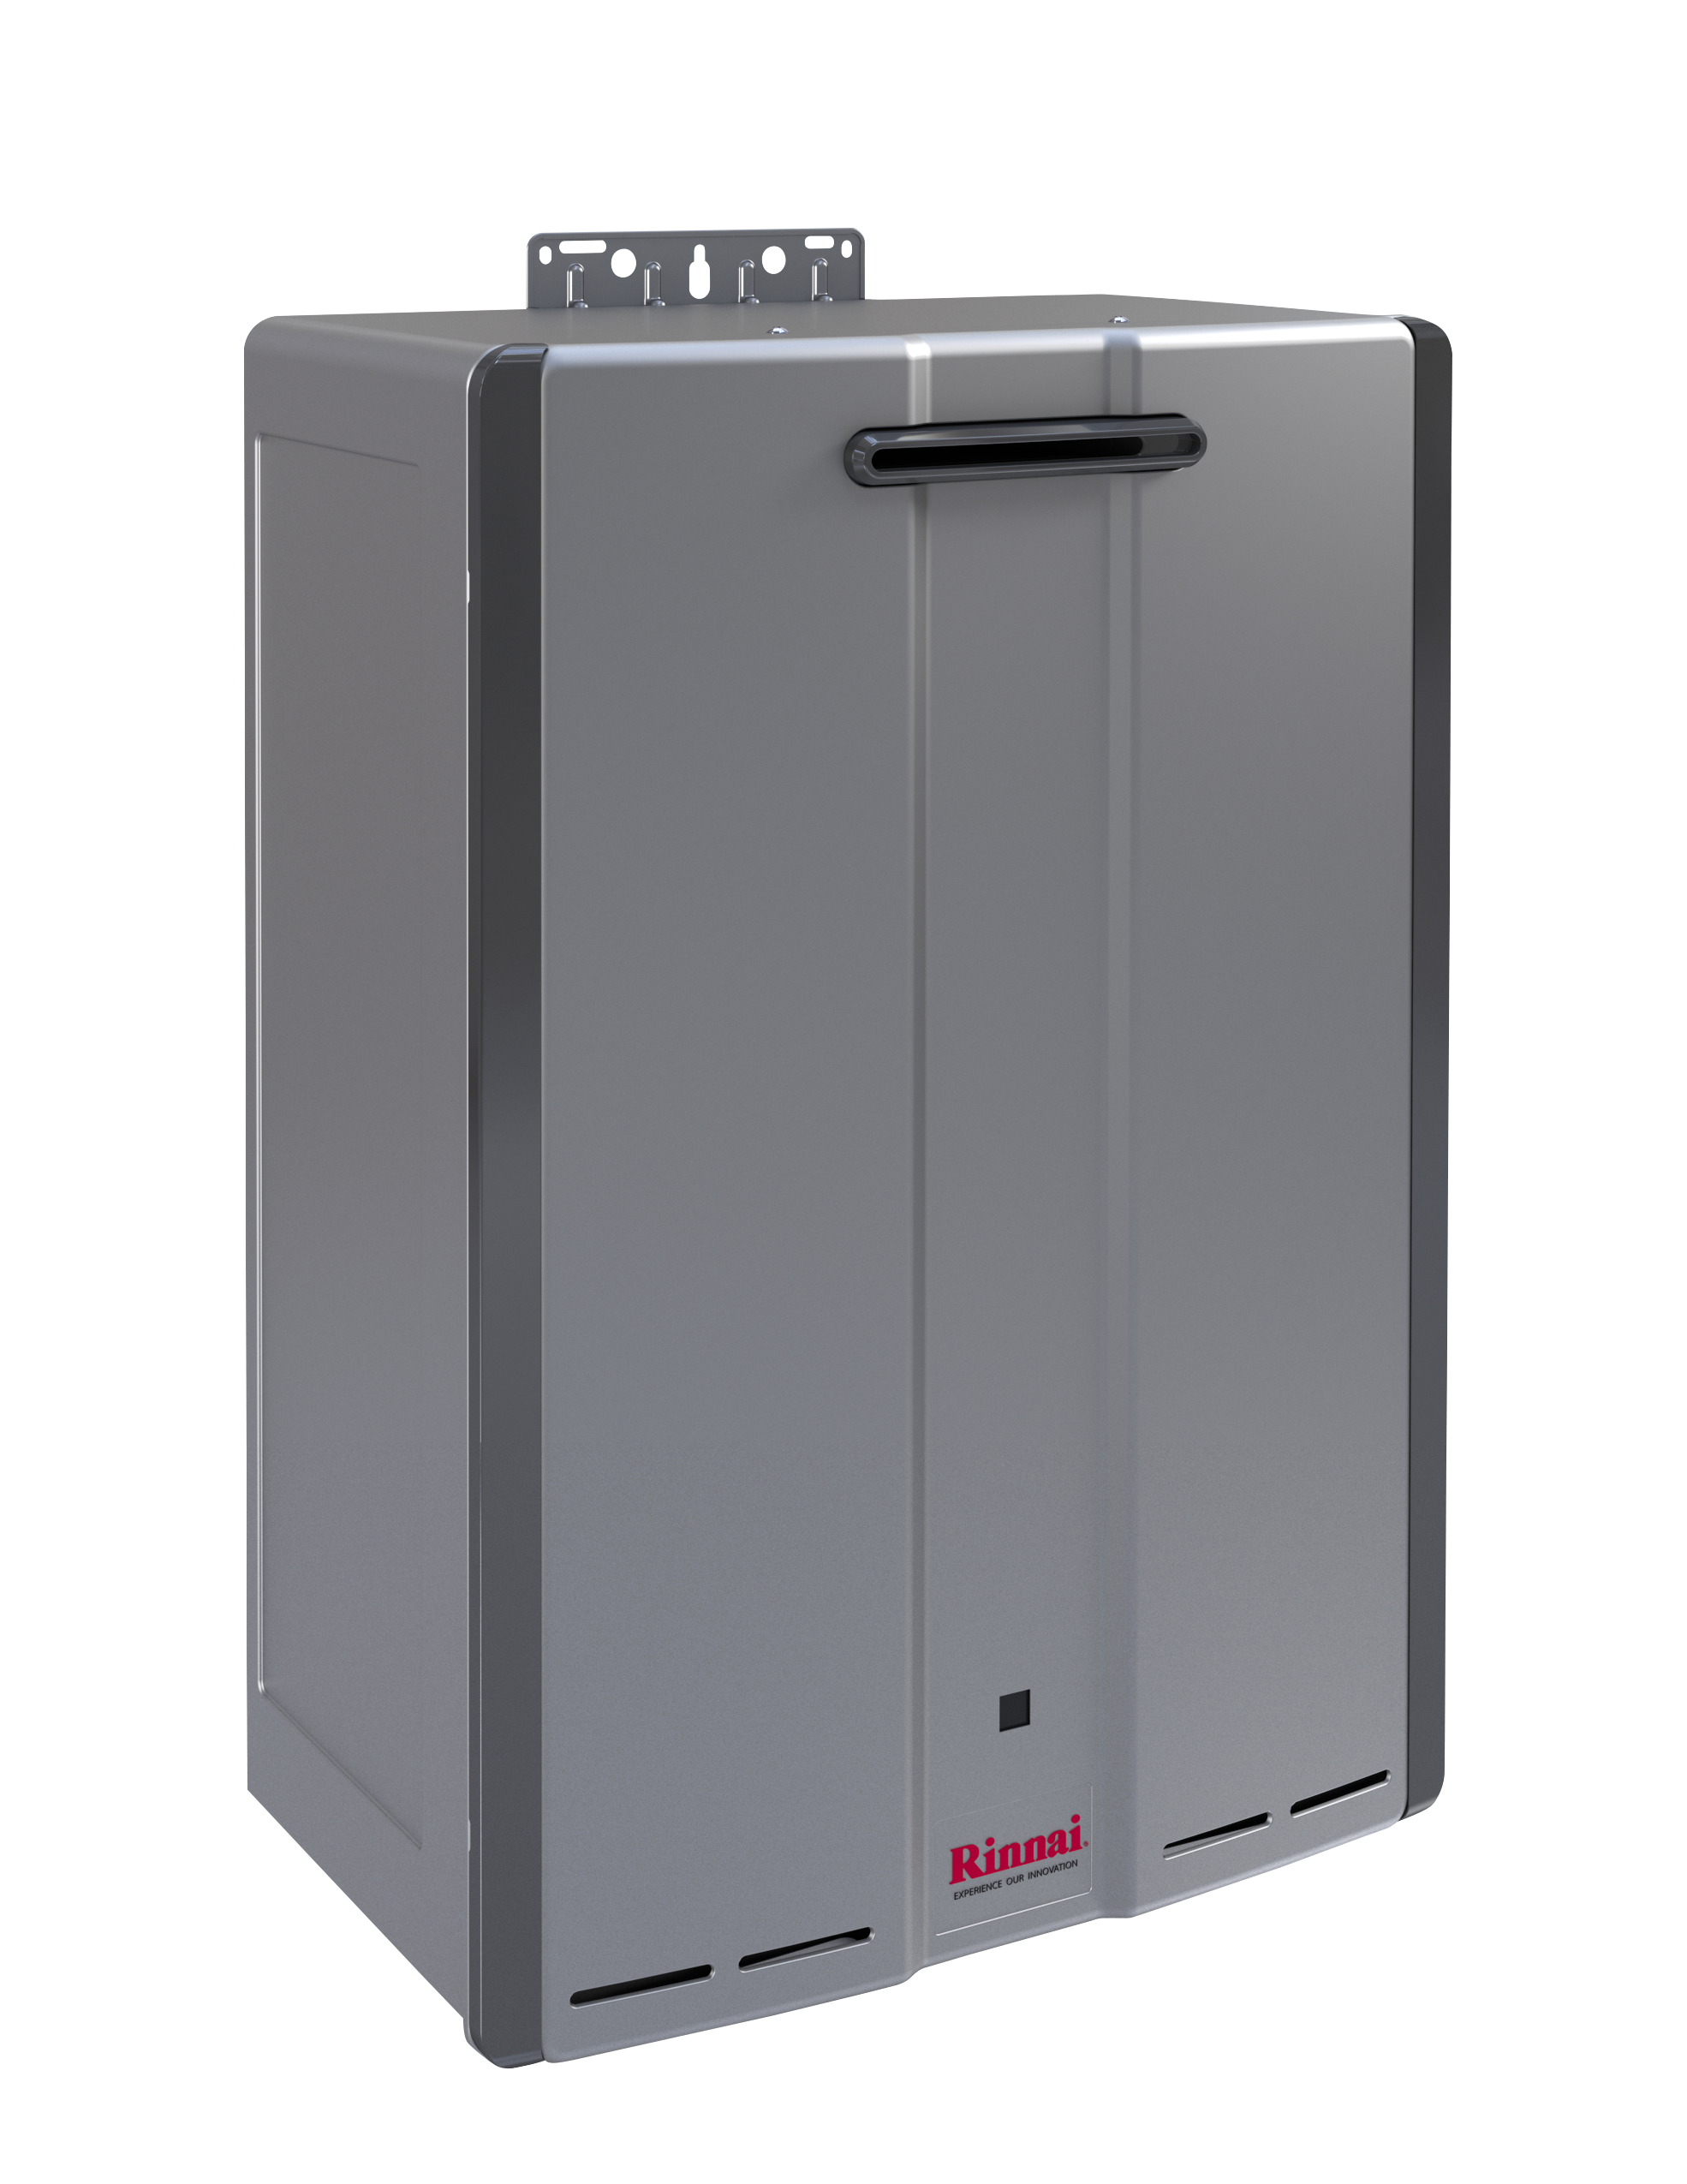 Sensei Ru180 Tankless Water Heaters Rinnai Tankless